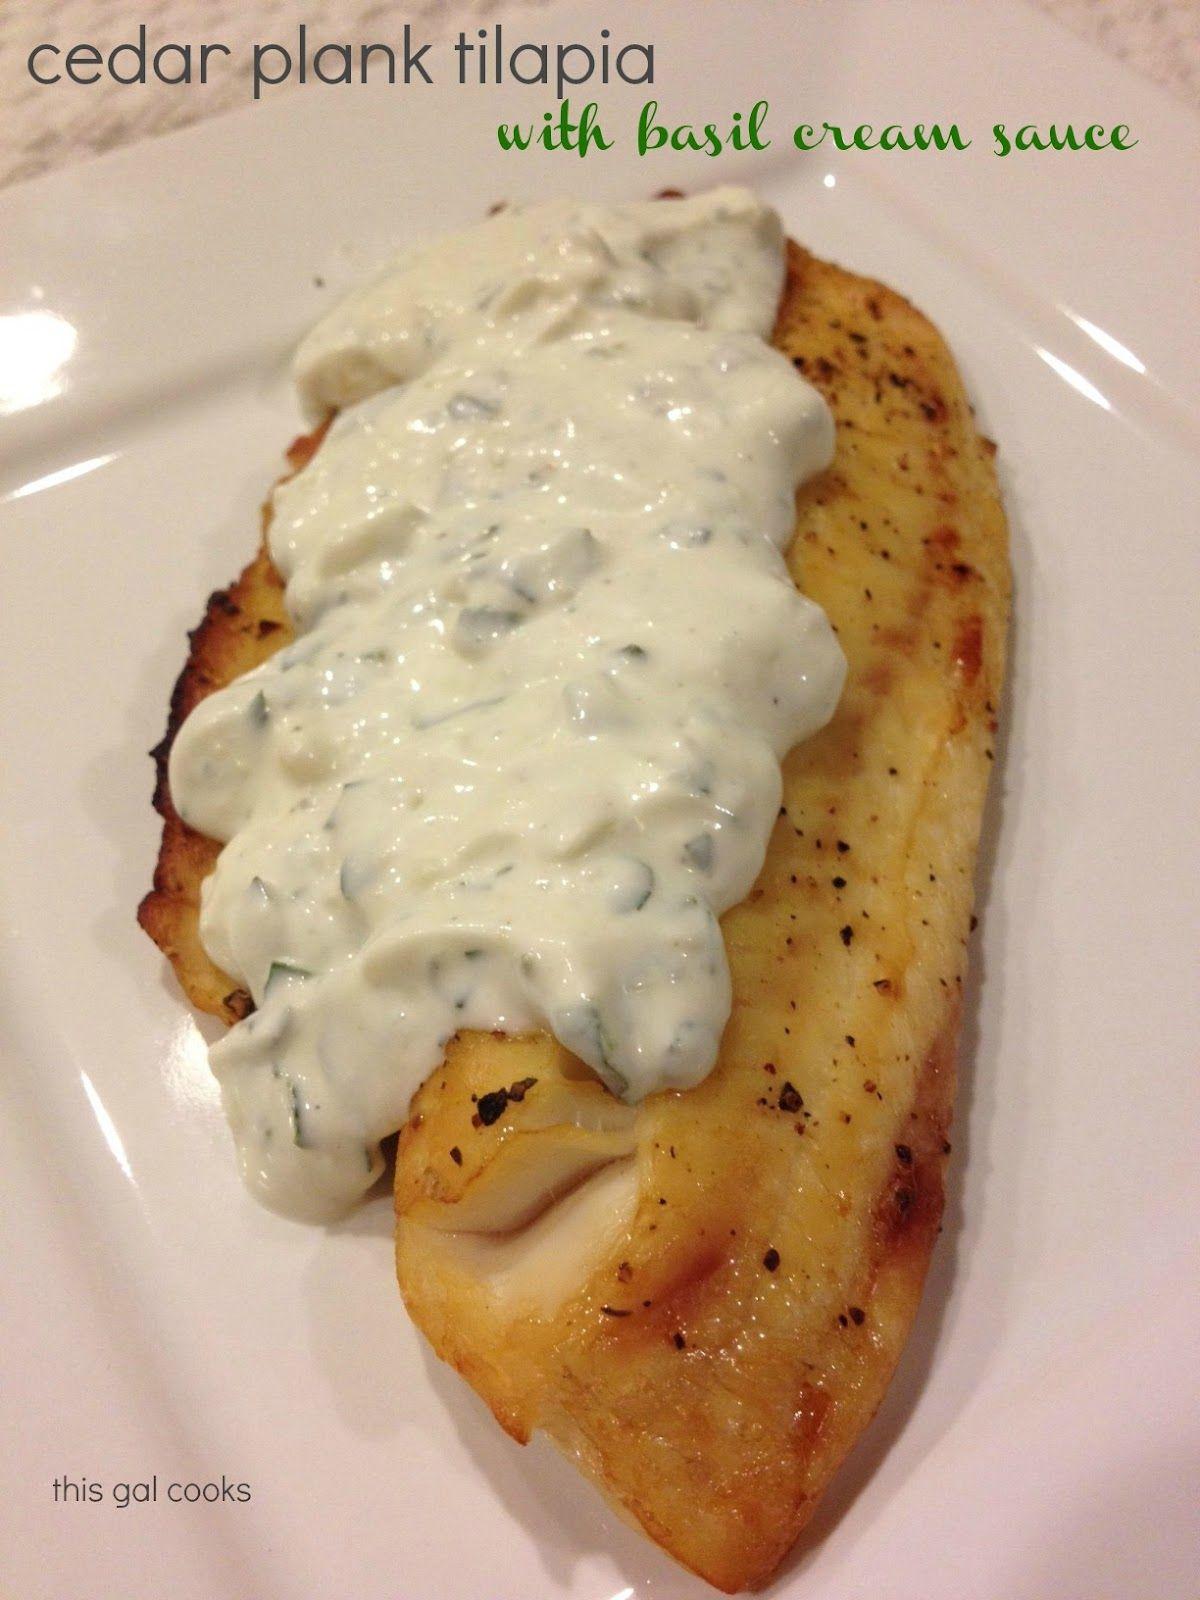 Cedar Plank Tilapia With Basil Cream Sauce Recipe Recipes Cooking Seafood Food